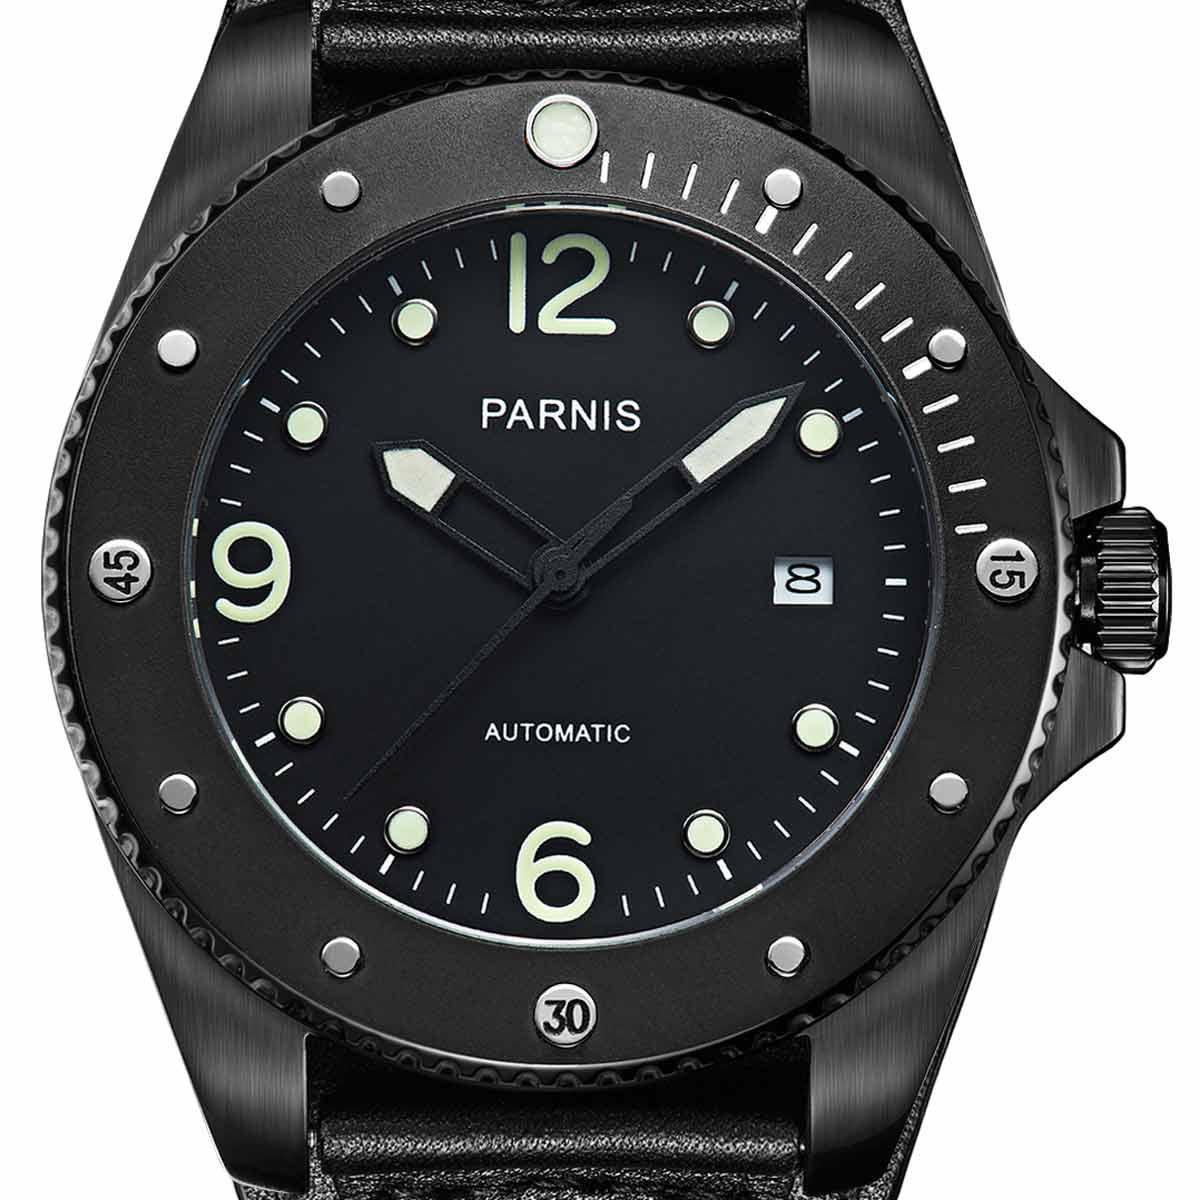 【NEW】PARNIS パーニス 自動巻き 腕時計 [PA6029-S3AL-BKBK] 並行輸入品 純正ケース メーカー保証12ヶ月